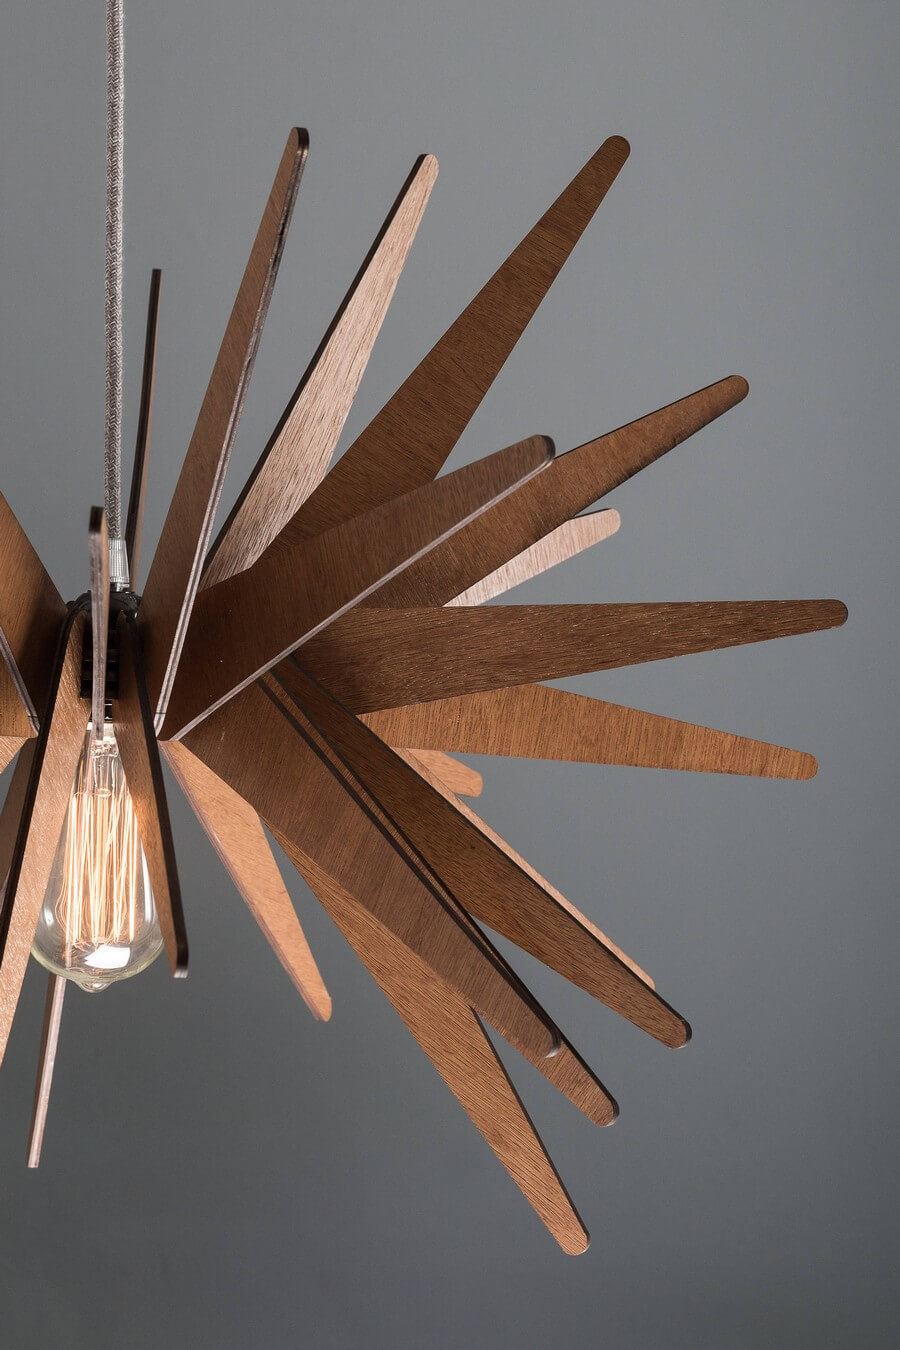 Wooden Pendant Lamp #2 - Laser Cutting Designs & Ideas